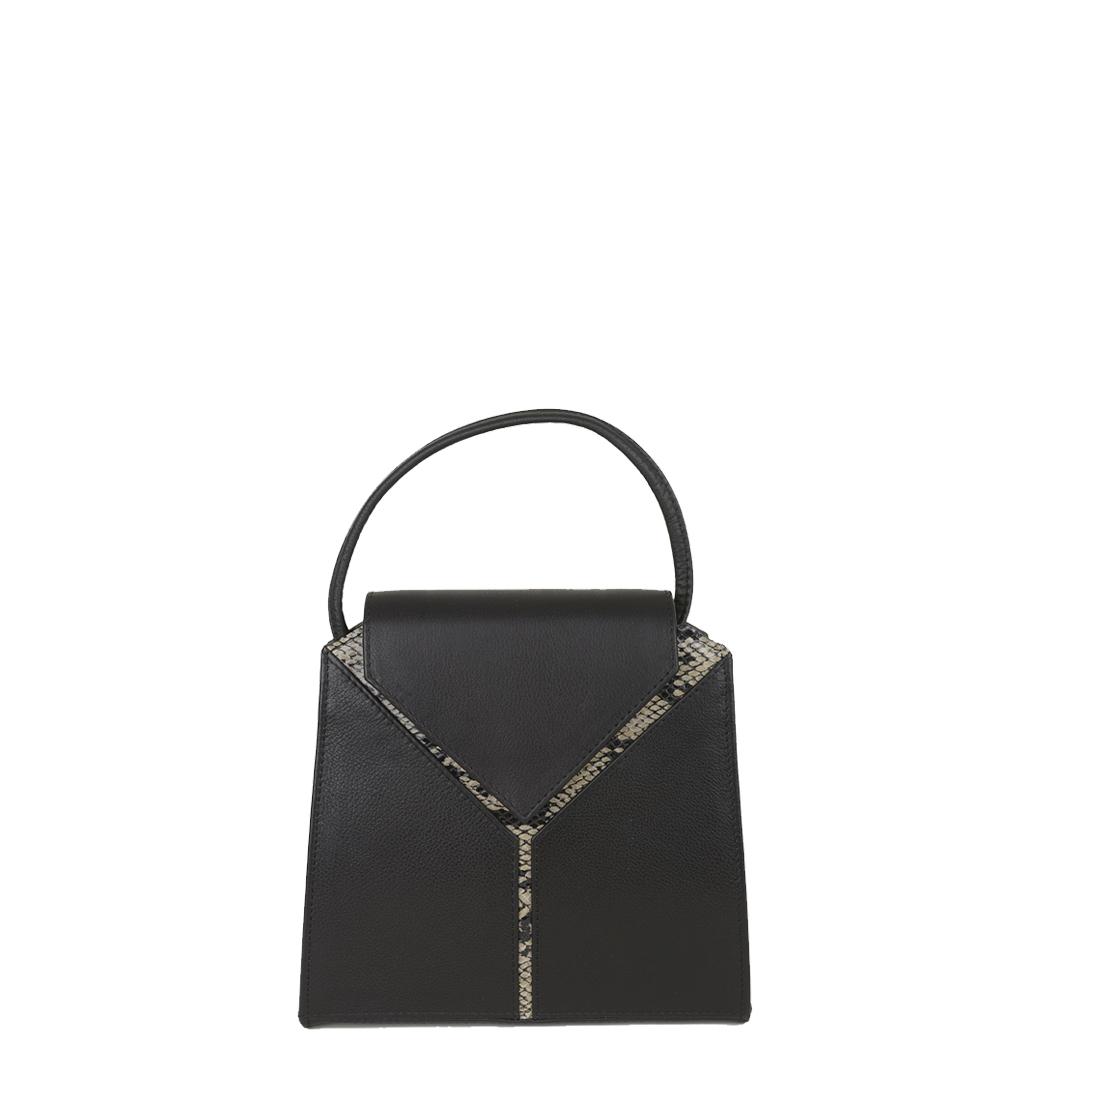 Yasmin Black Cream Python Evening Shoulder Bag